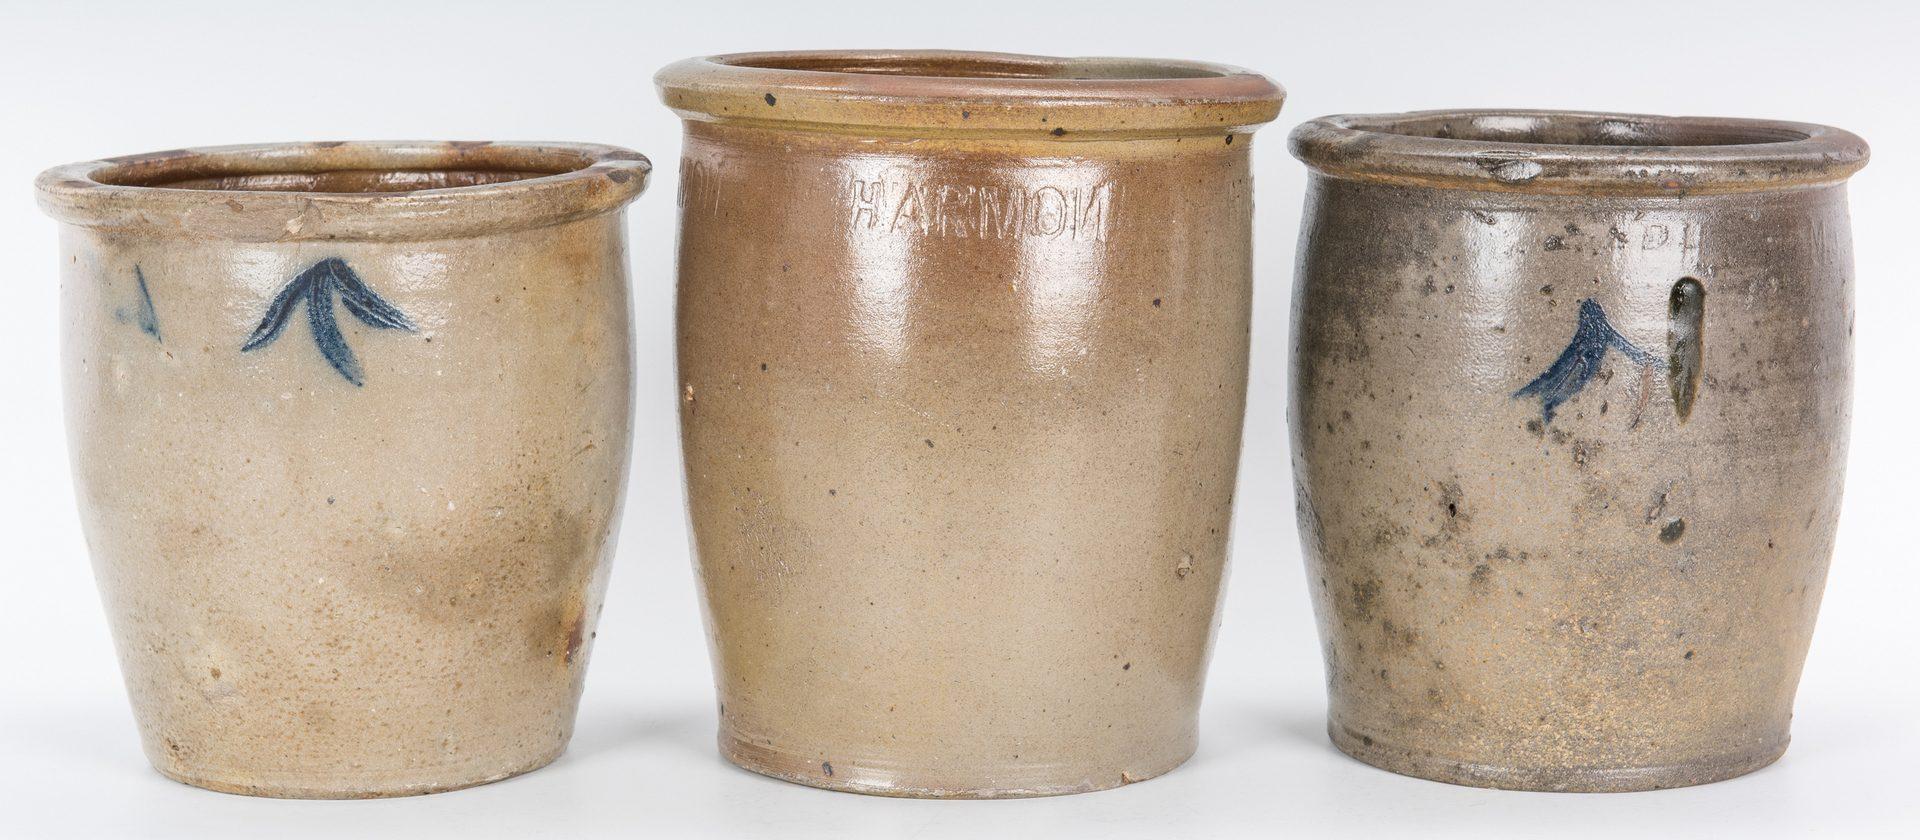 Lot 140: 3 East TN M. P. Harmon Stoneware Jars